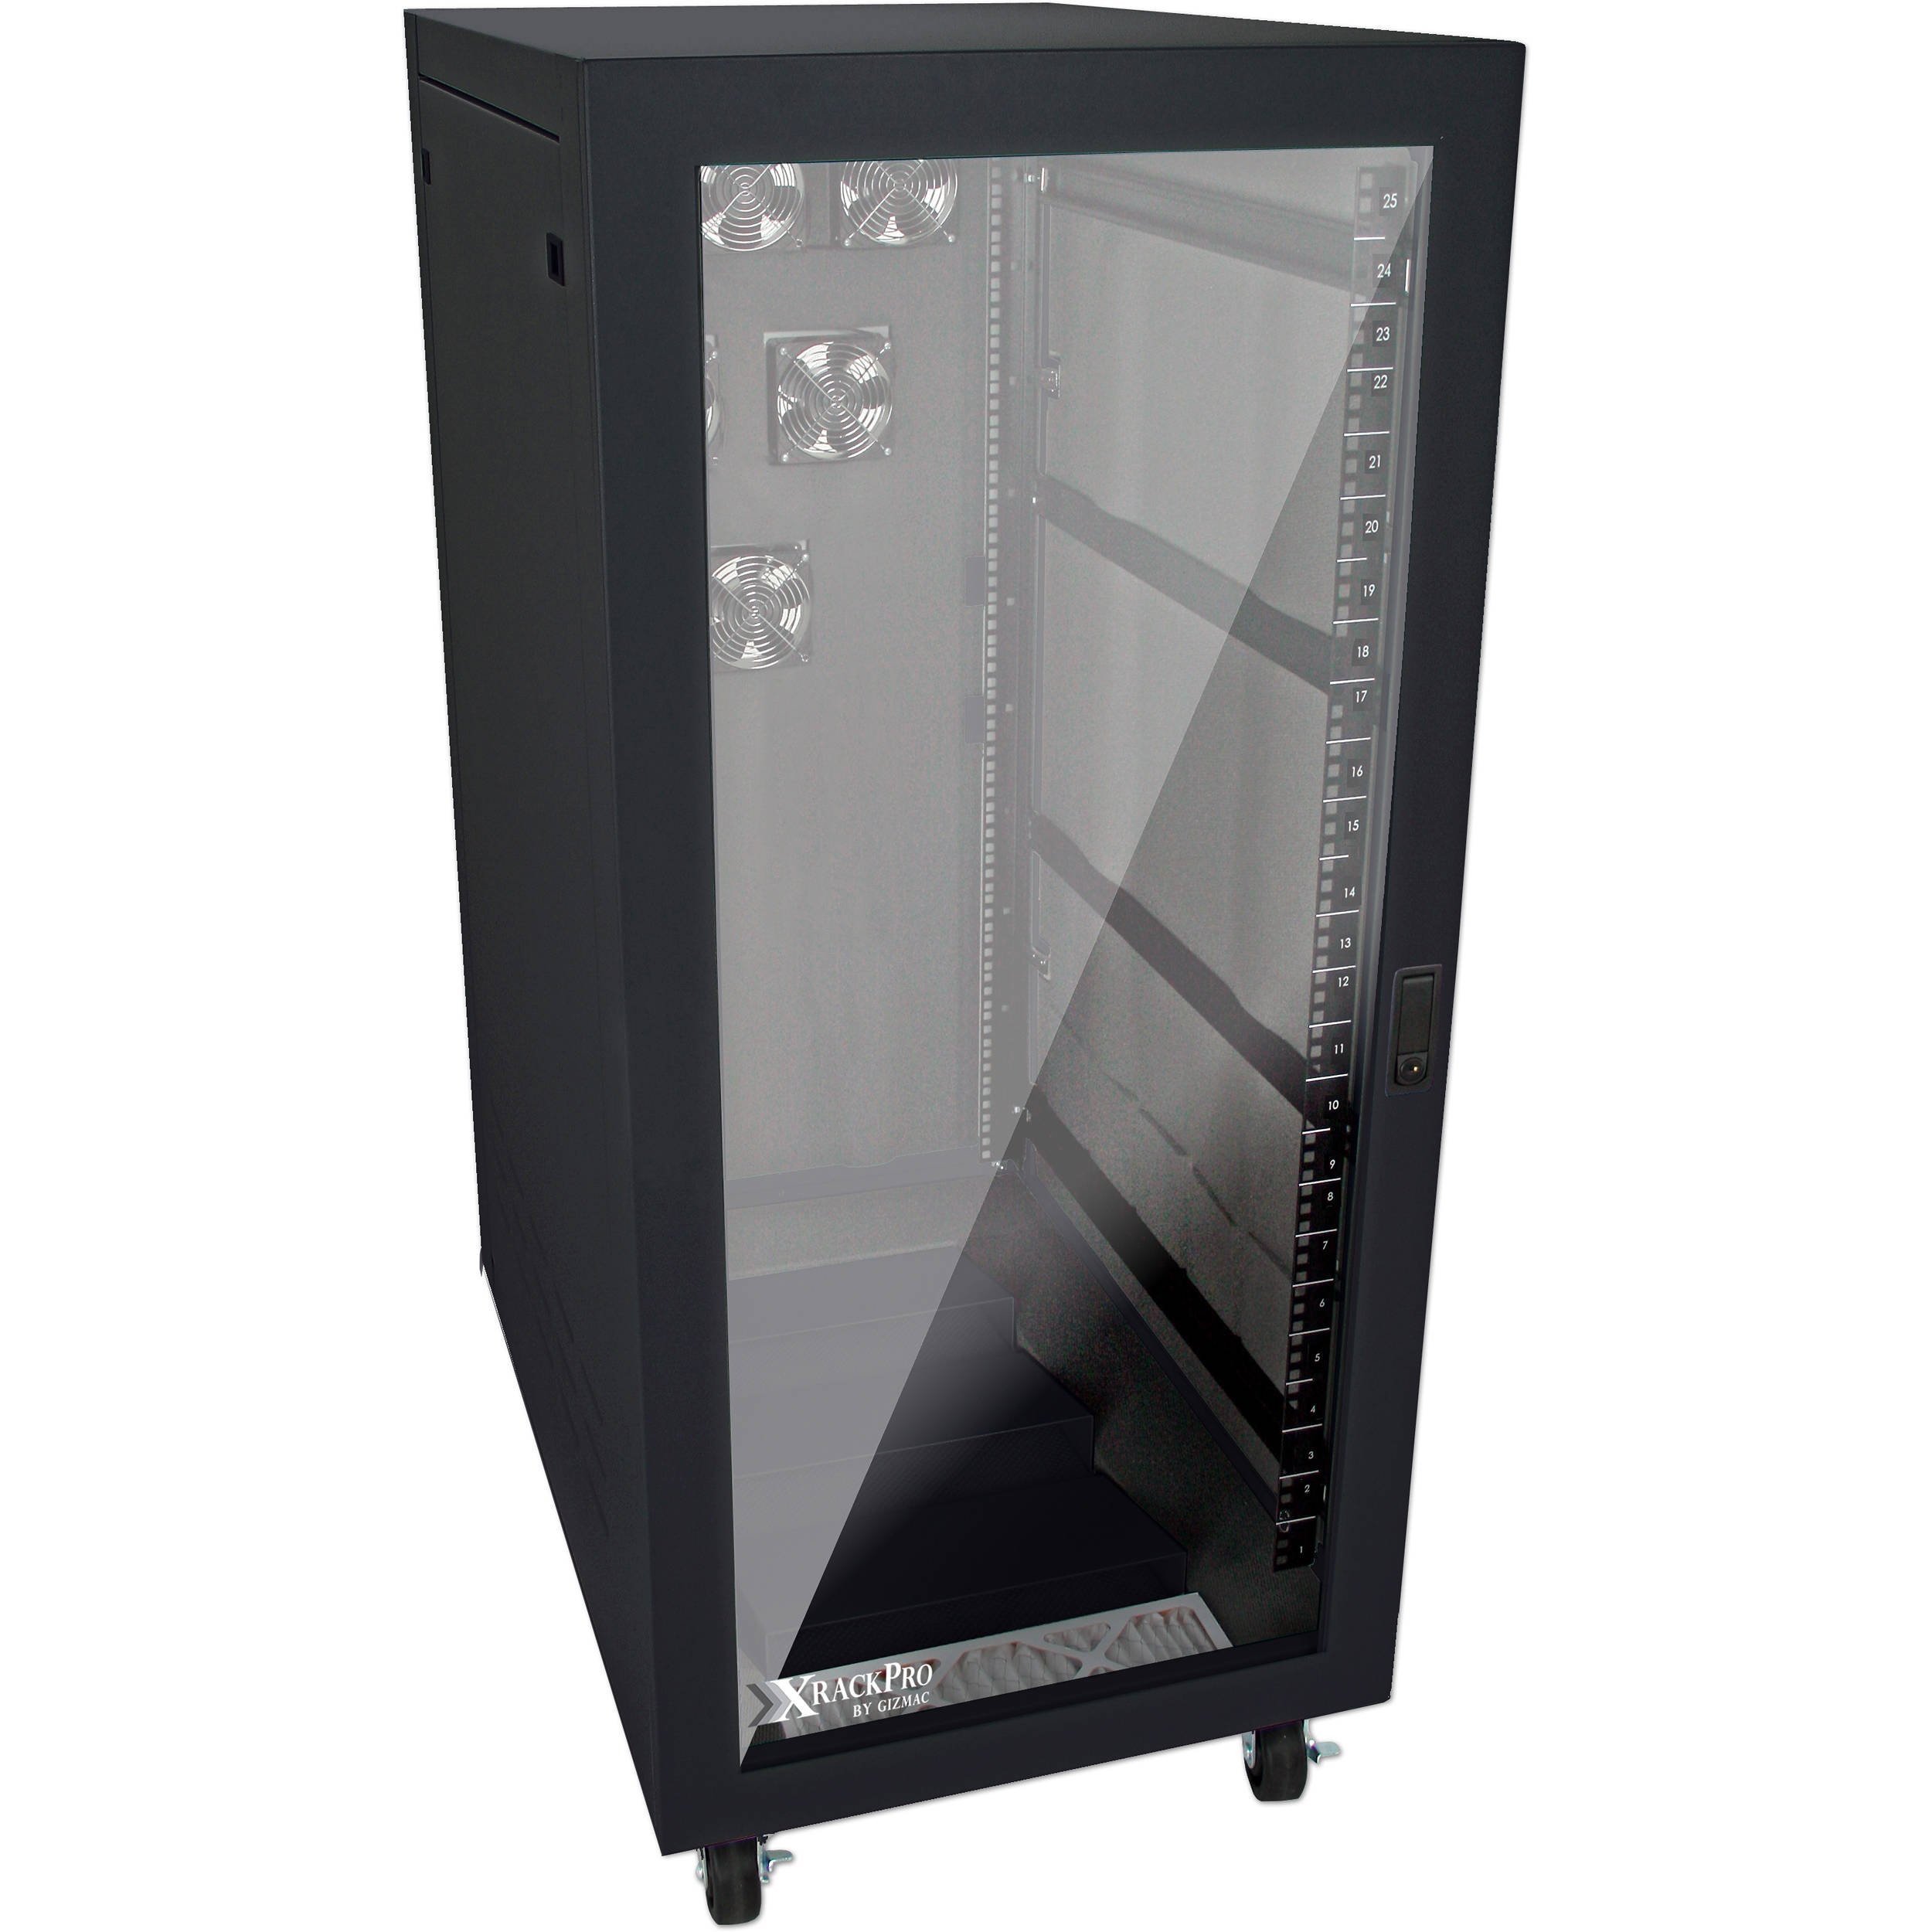 XRackPro2 Noise Reduction Server Rack Enclosure (25 RU, Black)